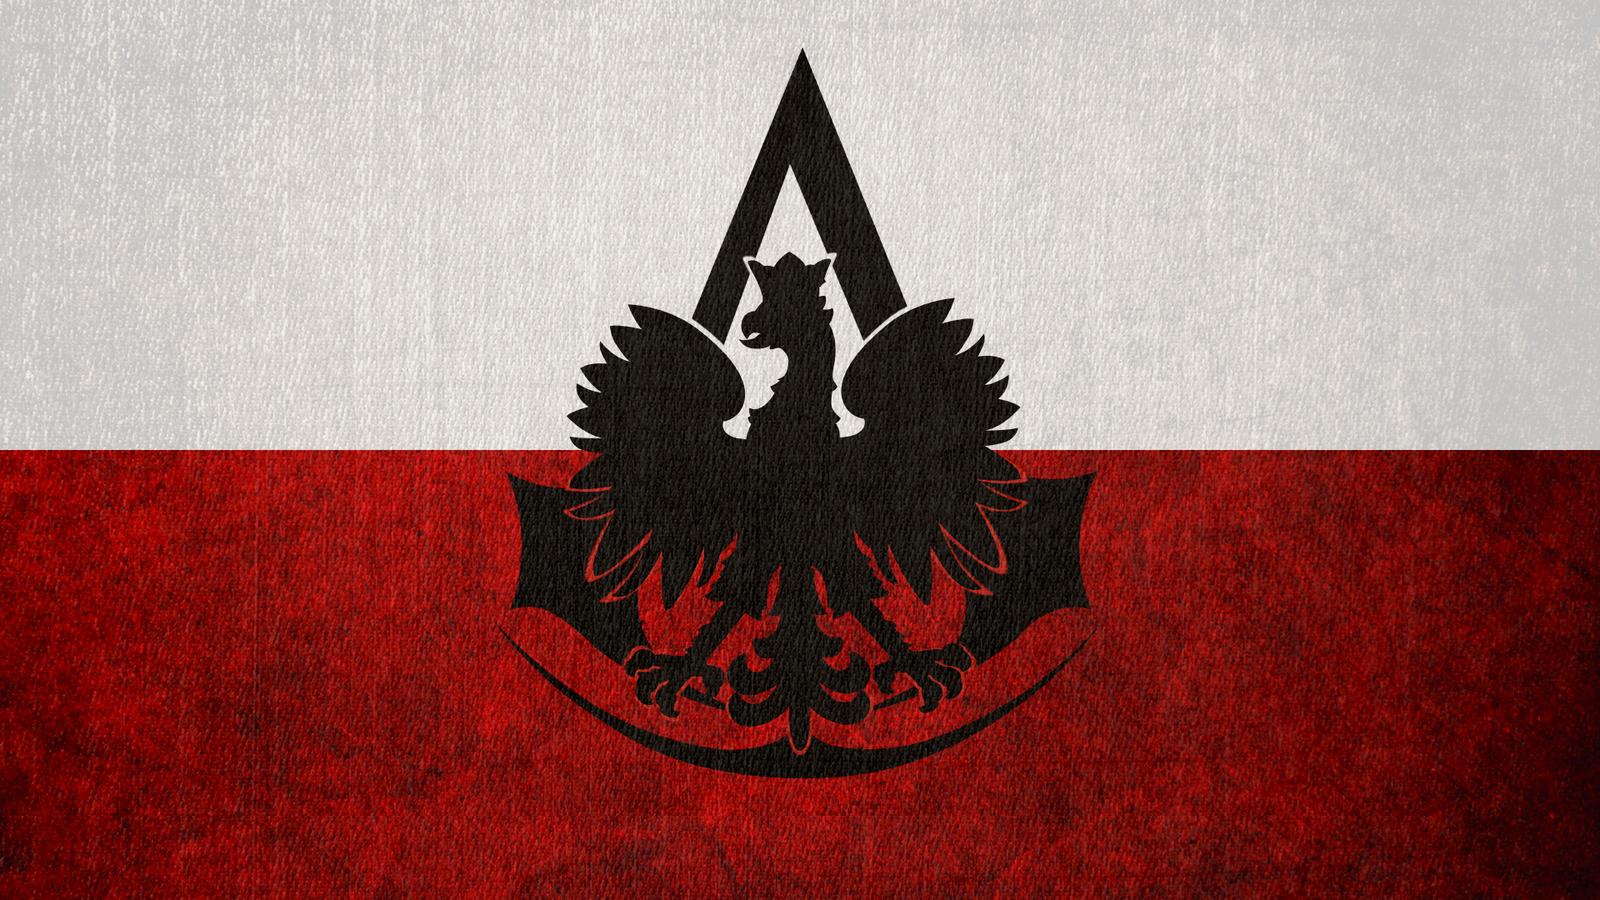 Me meaning of polish flag - Assassin S Creed Bureau Of Poland Flag By Okiir Deviantart Com